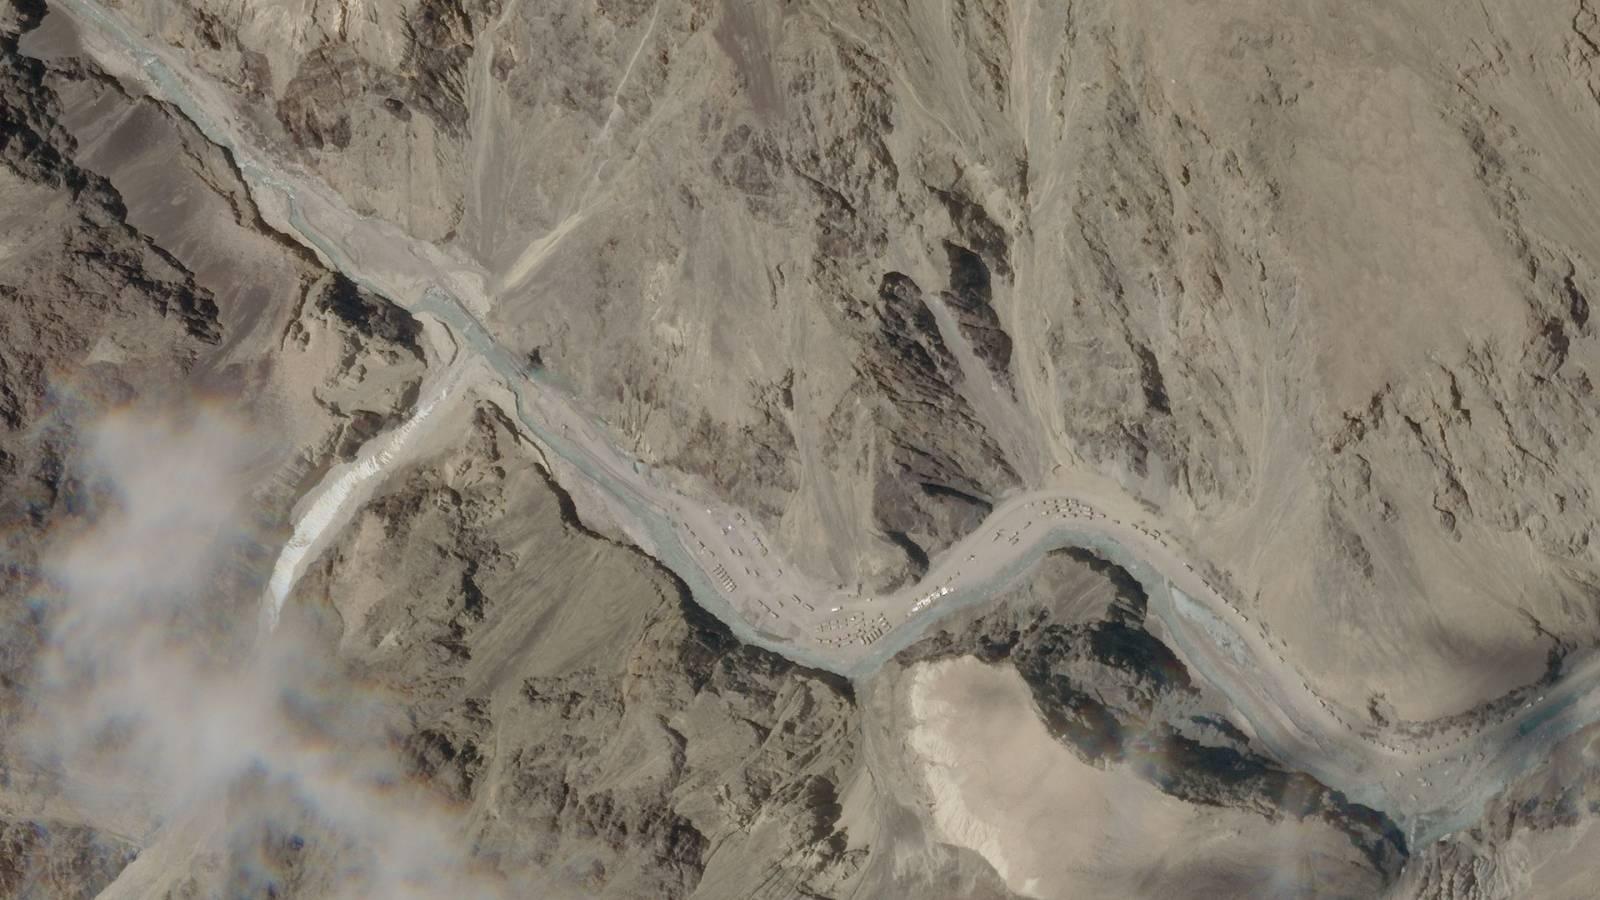 A satellite image taken over Galwan Valley in Ladakh